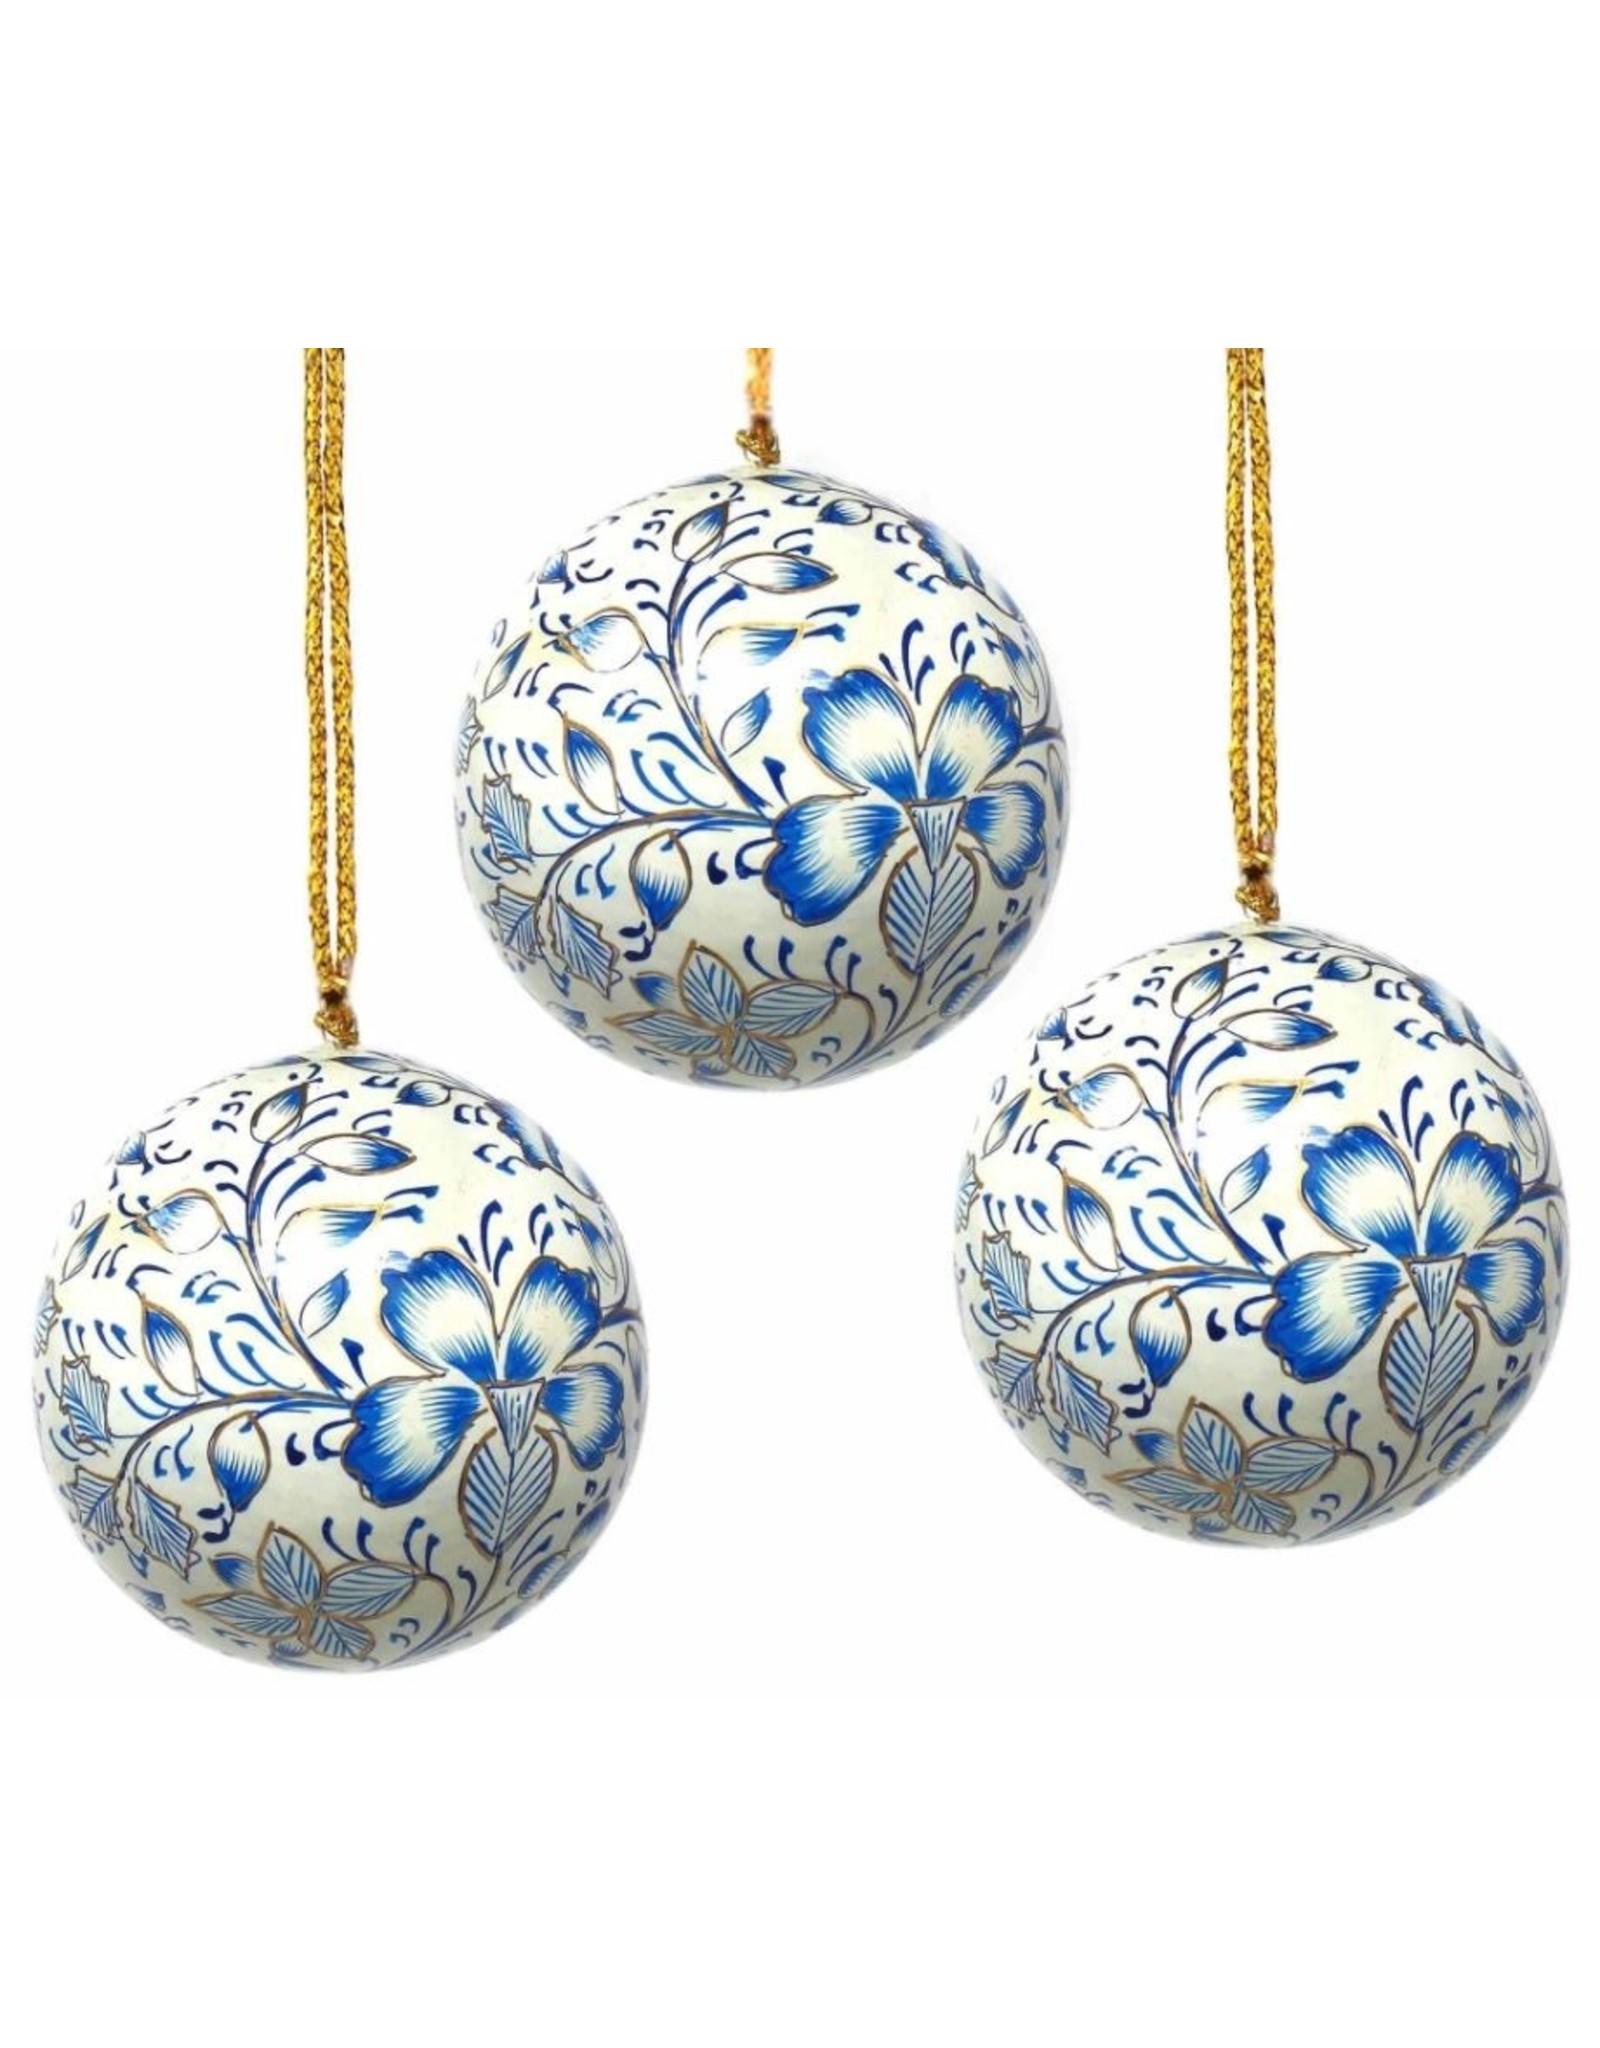 Global Crafts Handpainted Paper-mache Ornament, Blue floral